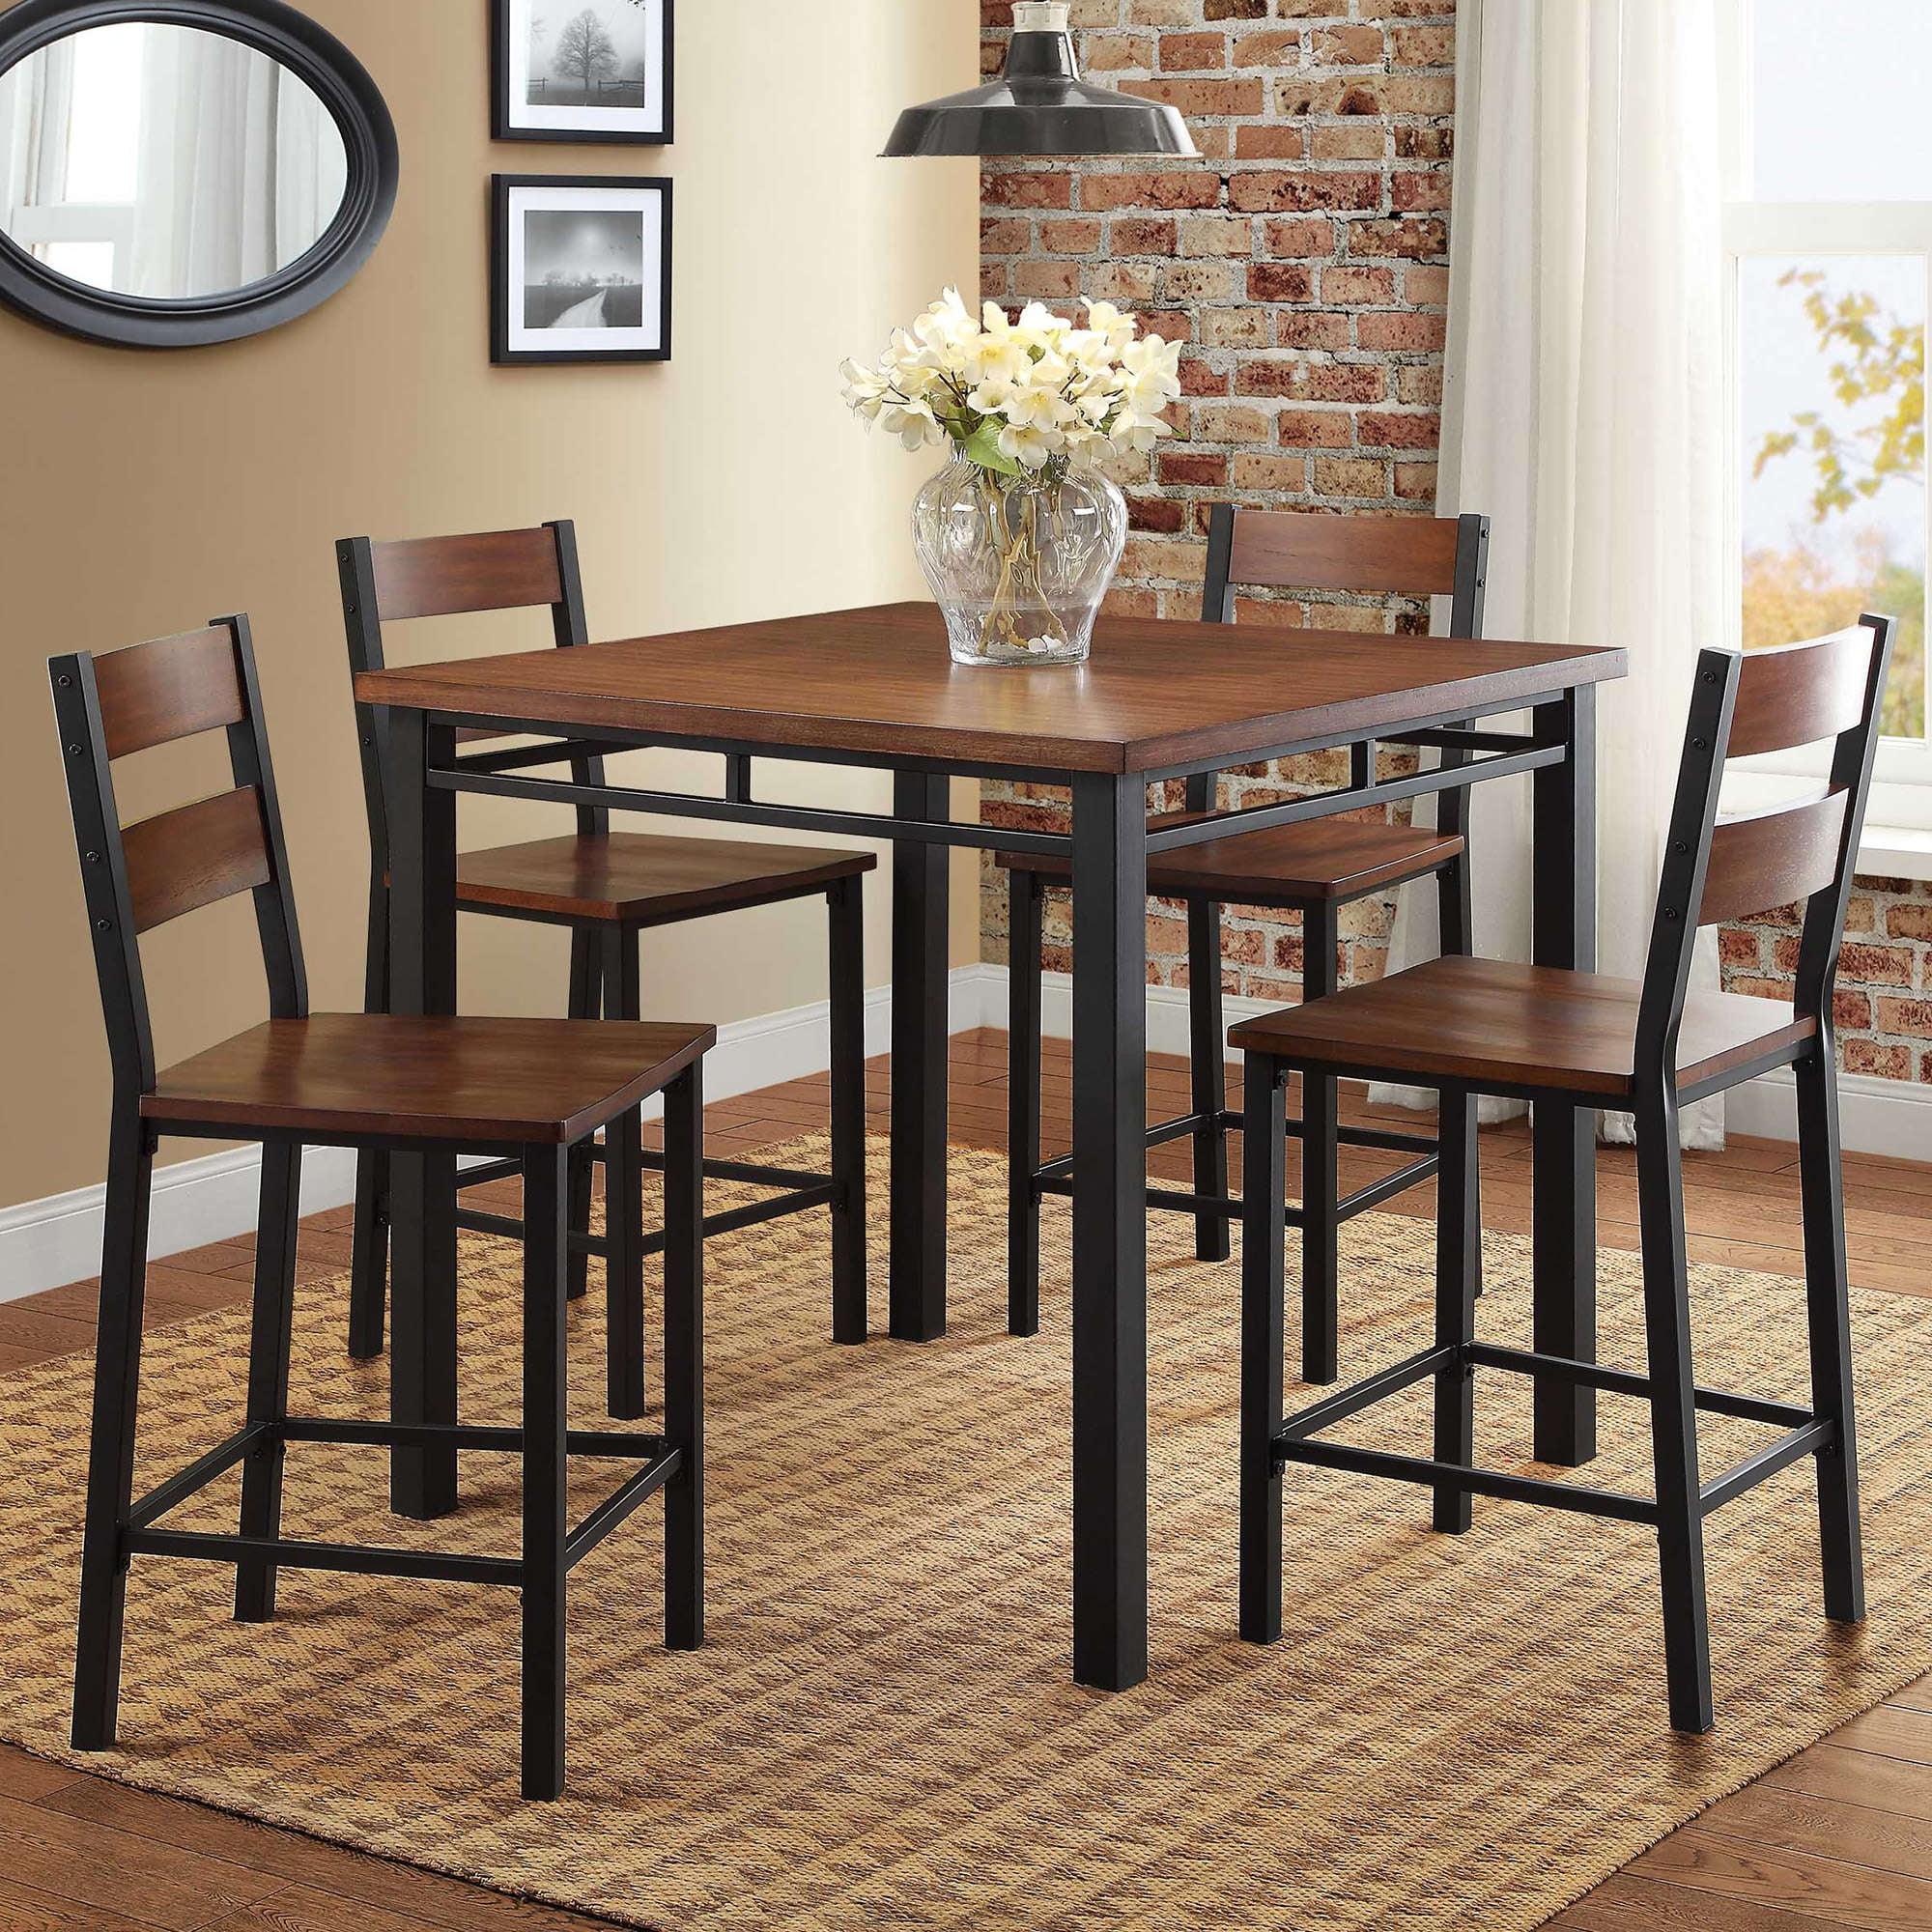 antique oak dining chairs mid century modern toronto better homes gardens mercer 5 piece counter height set vintage walmart com